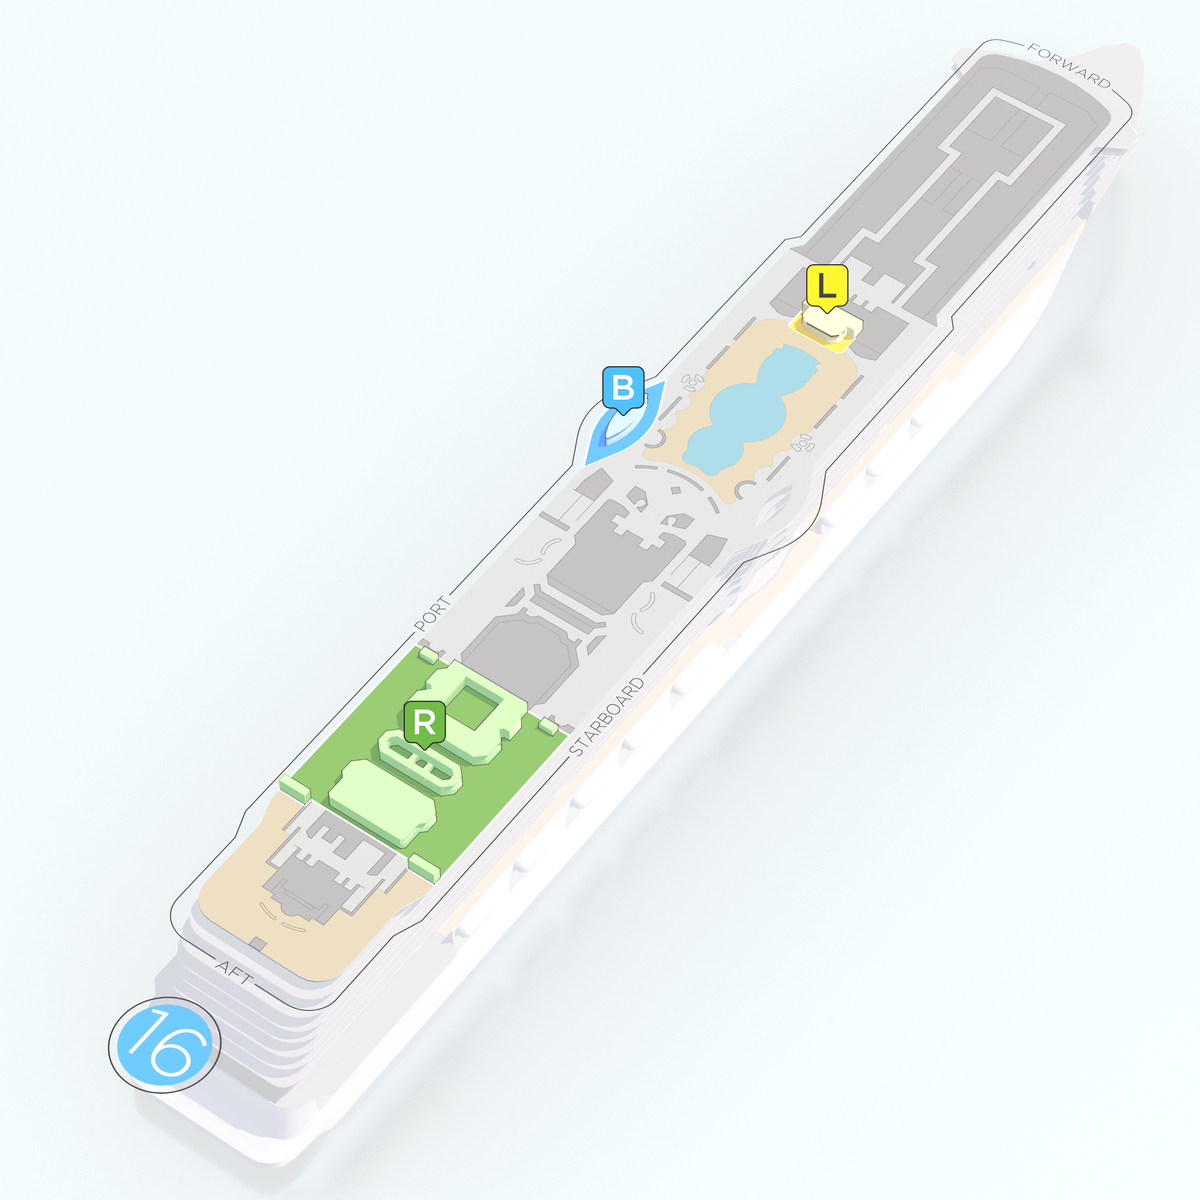 Ship Navigation - UI Mockup